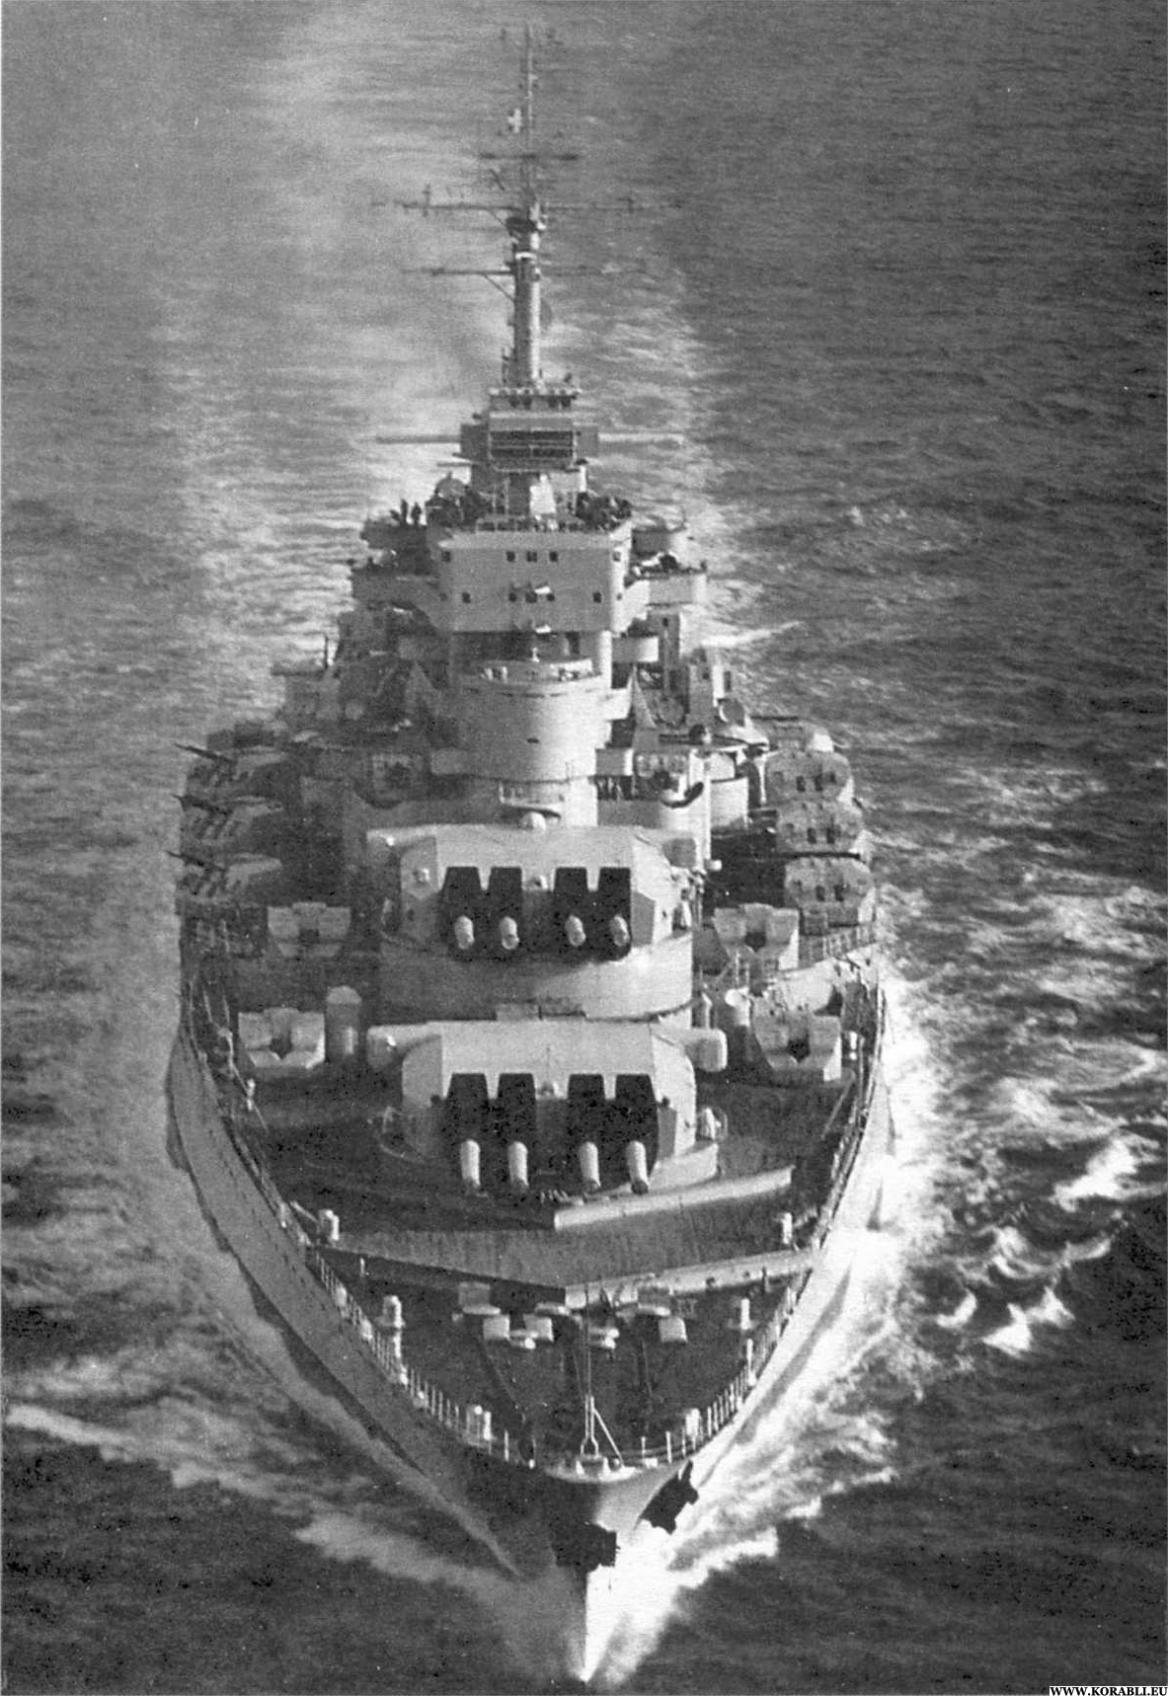 Wwii italy navy battleship roma 1943 plastic model images list - French Battleship Strasbourg Other Warships 118 Pinterest Battleship And French Army